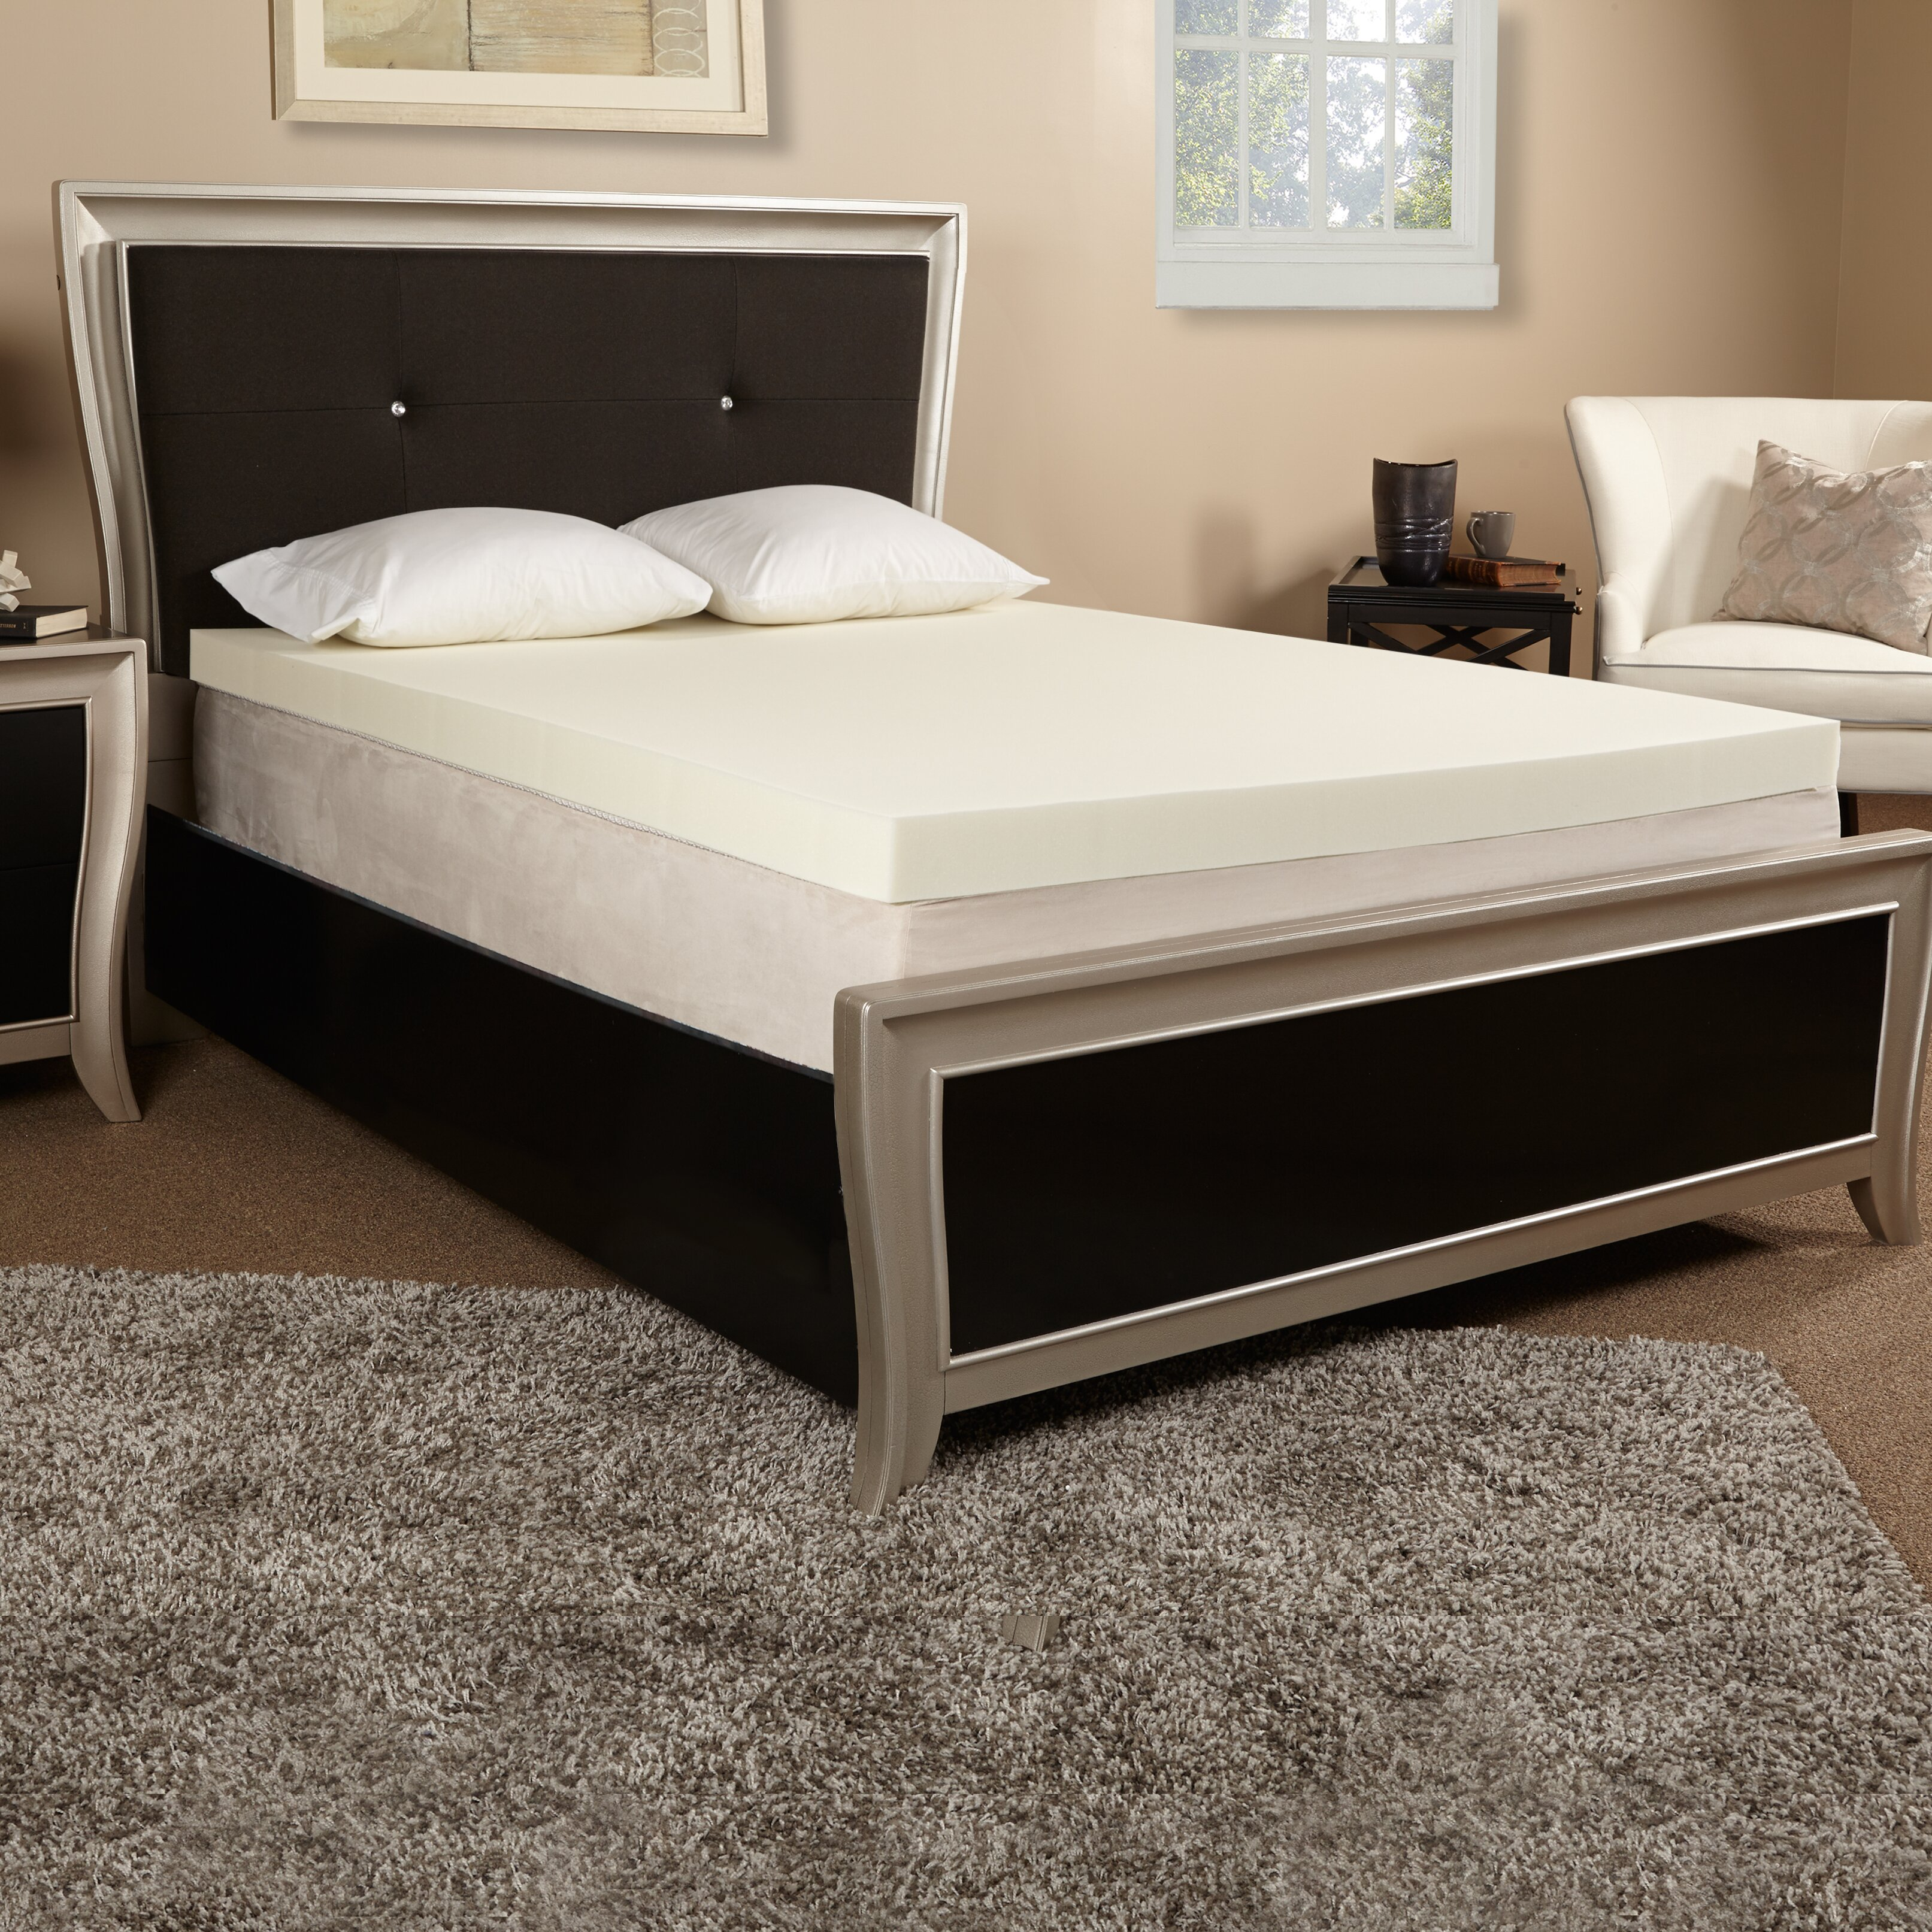 luxury solutions 4 memory foam mattress topper reviews wayfair. Black Bedroom Furniture Sets. Home Design Ideas